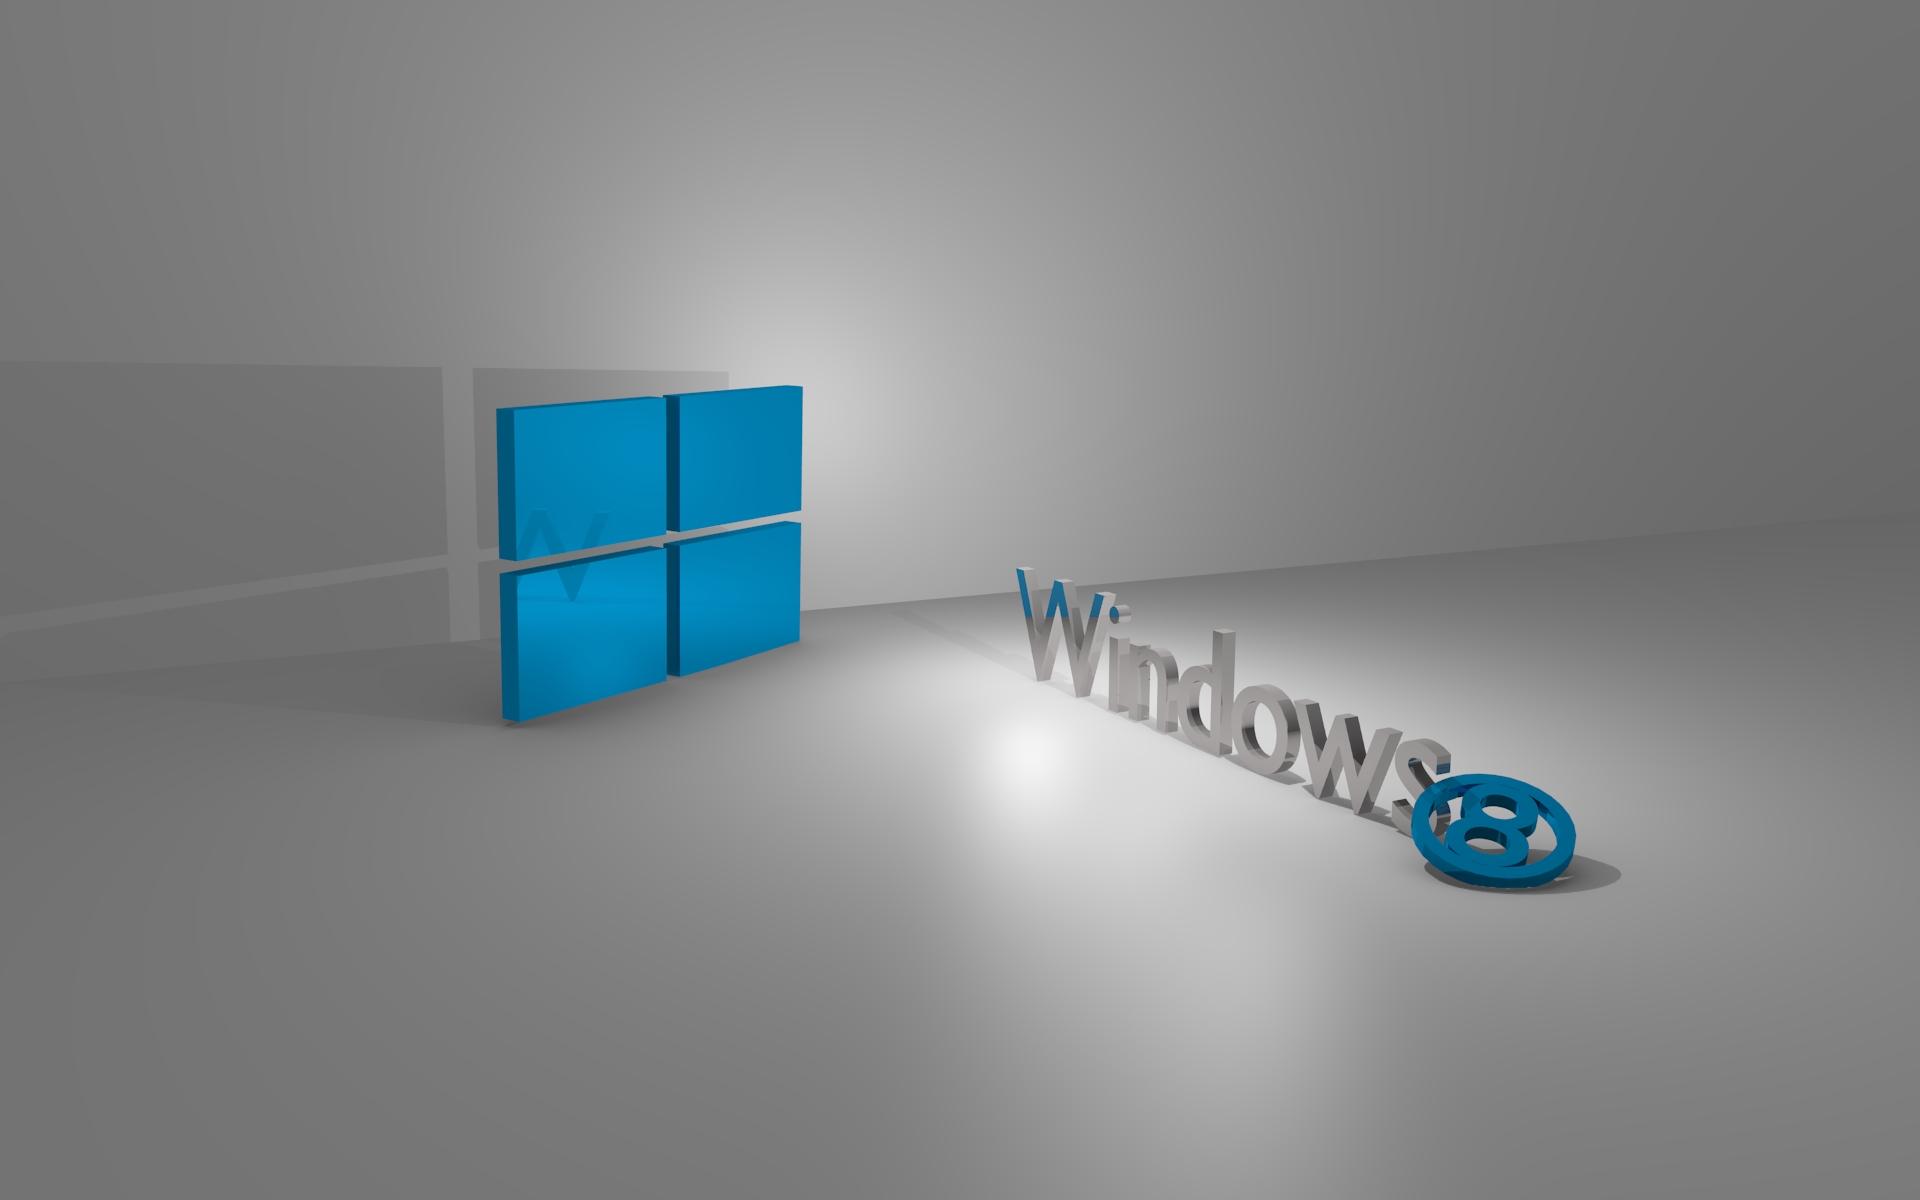 windows 8 cools 3d image wallpaper | wallpaperlepi